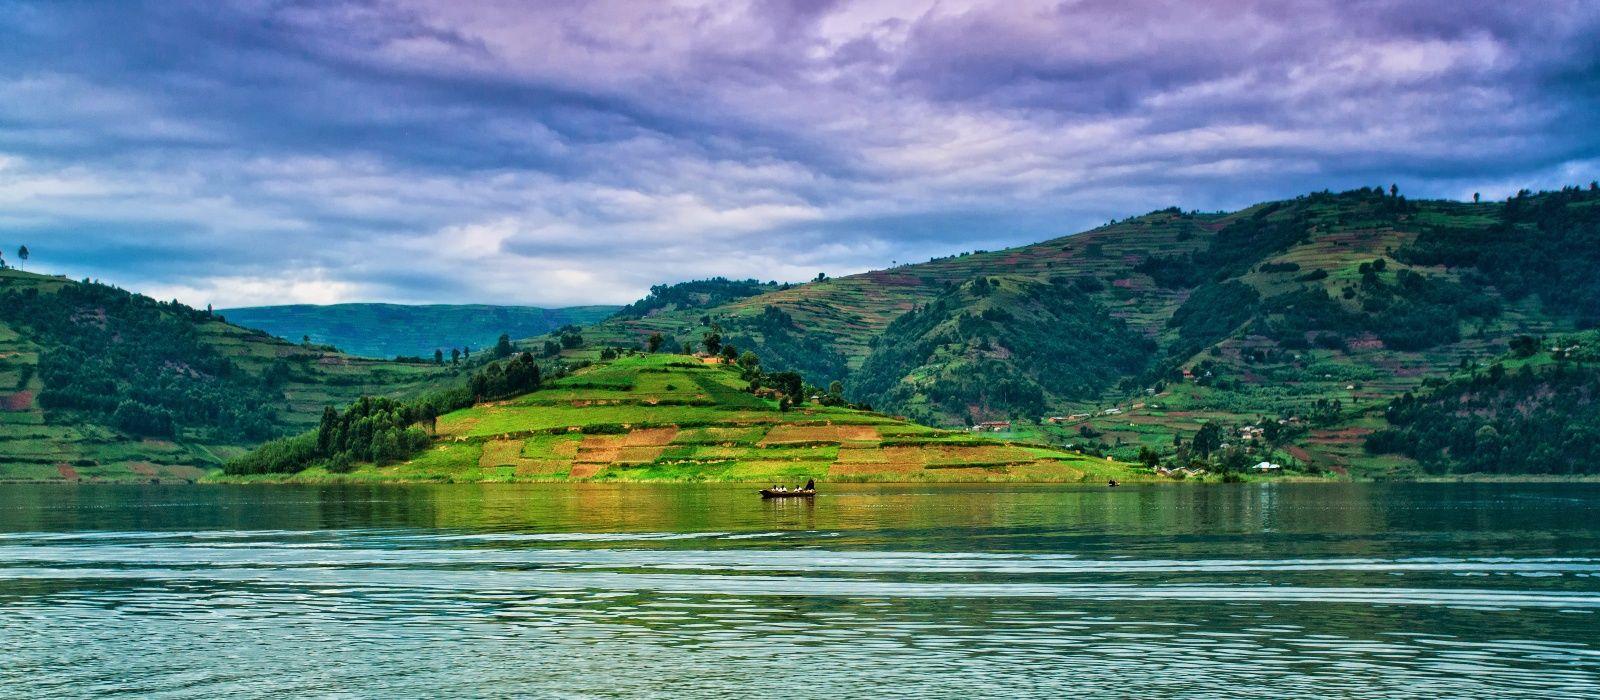 Destination Lake Bunyonyi Uganda